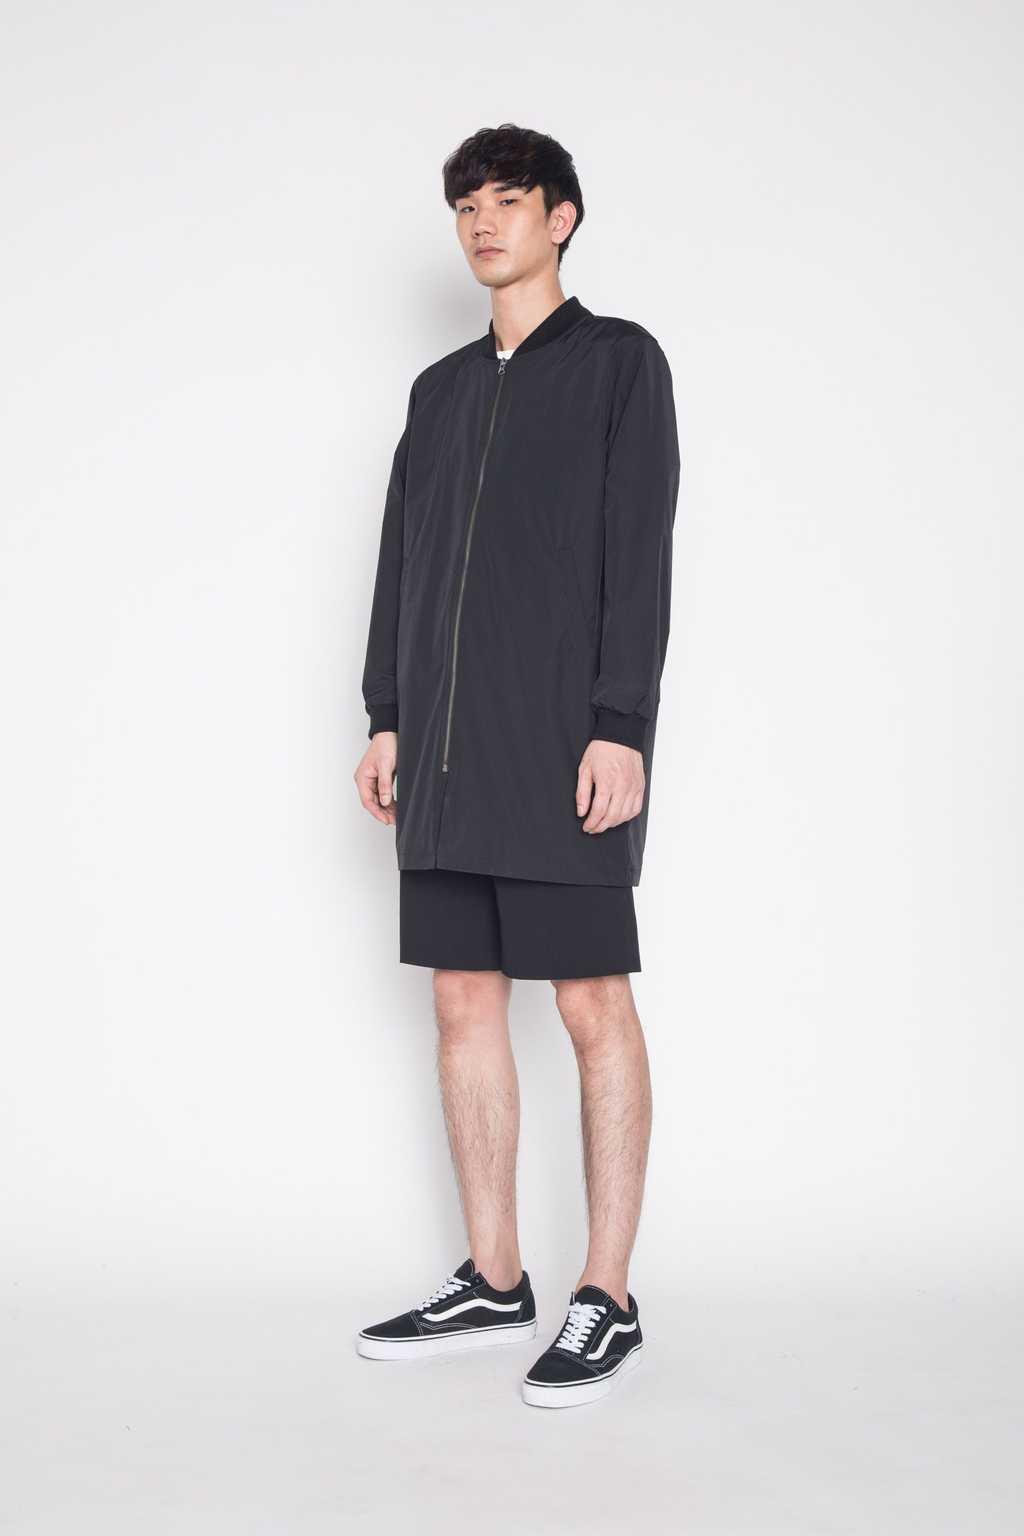 Jacket G004 Black 3